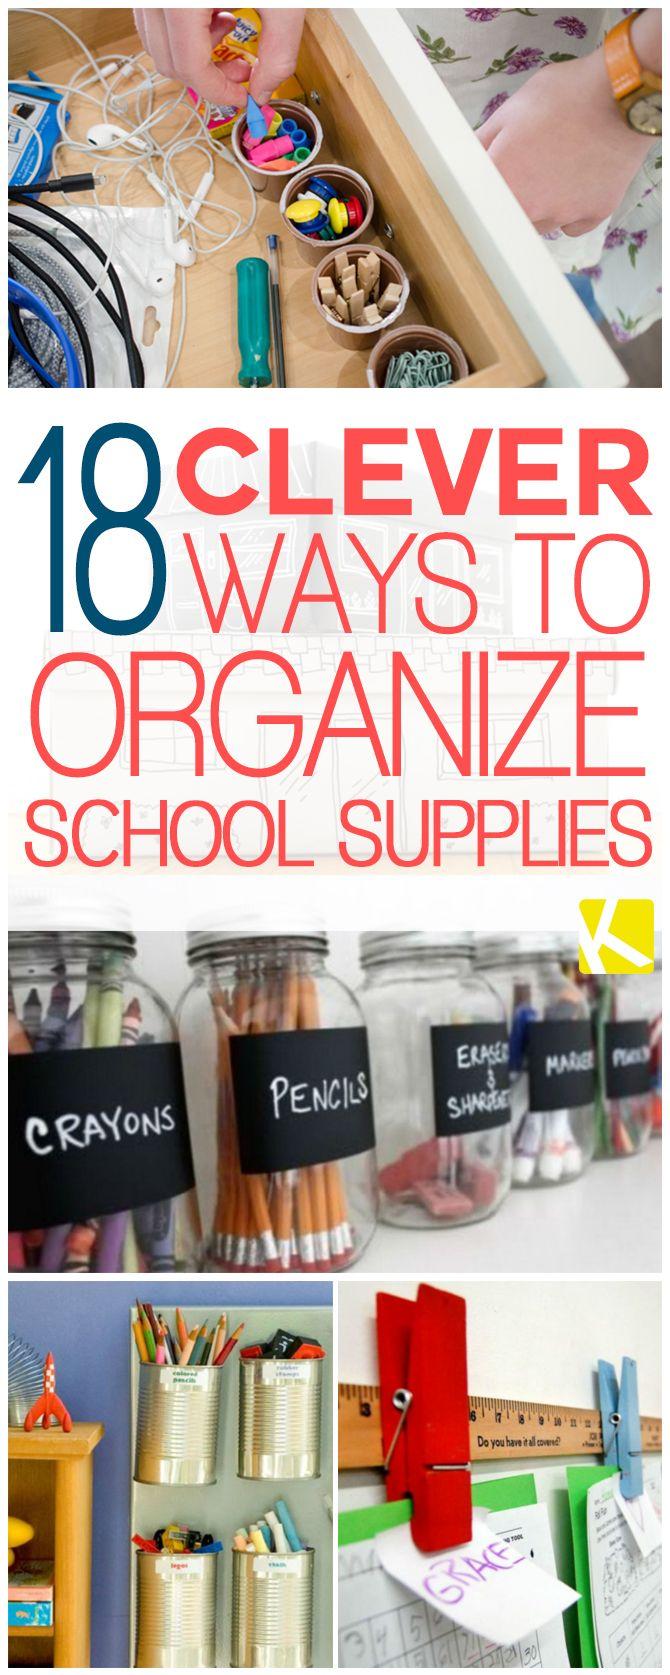 18 Clever Ways to Organize School Supplies